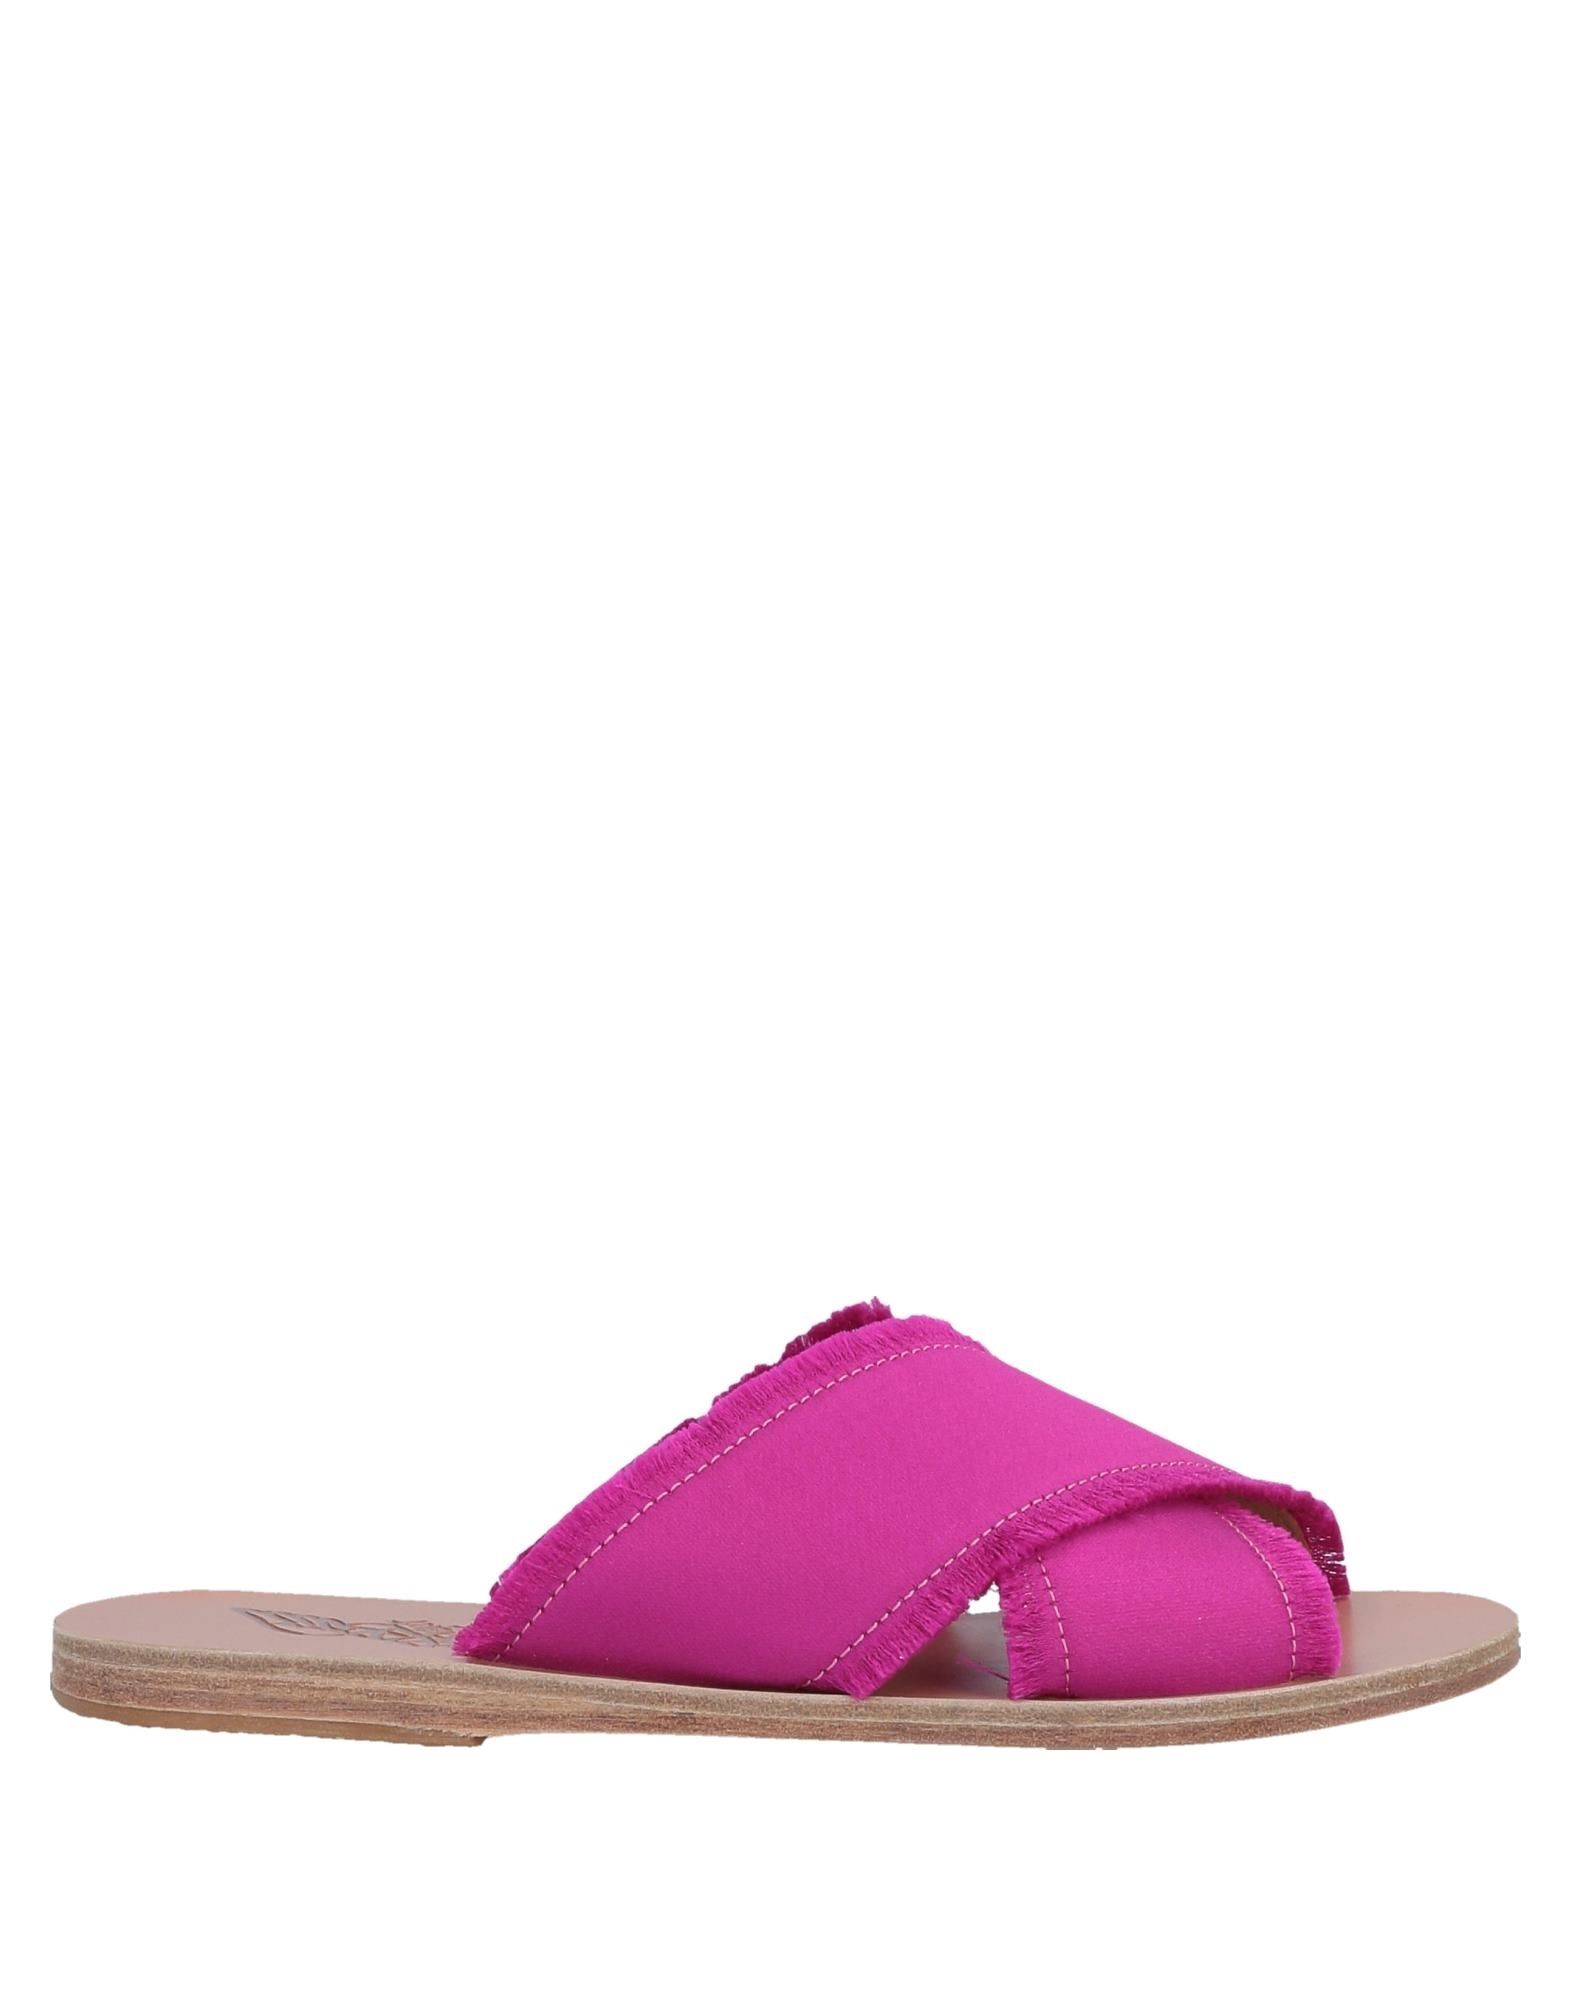 Sandales Ancient Greek Sandals Femme - Sandales Ancient Greek Sandals   - 11614235XV